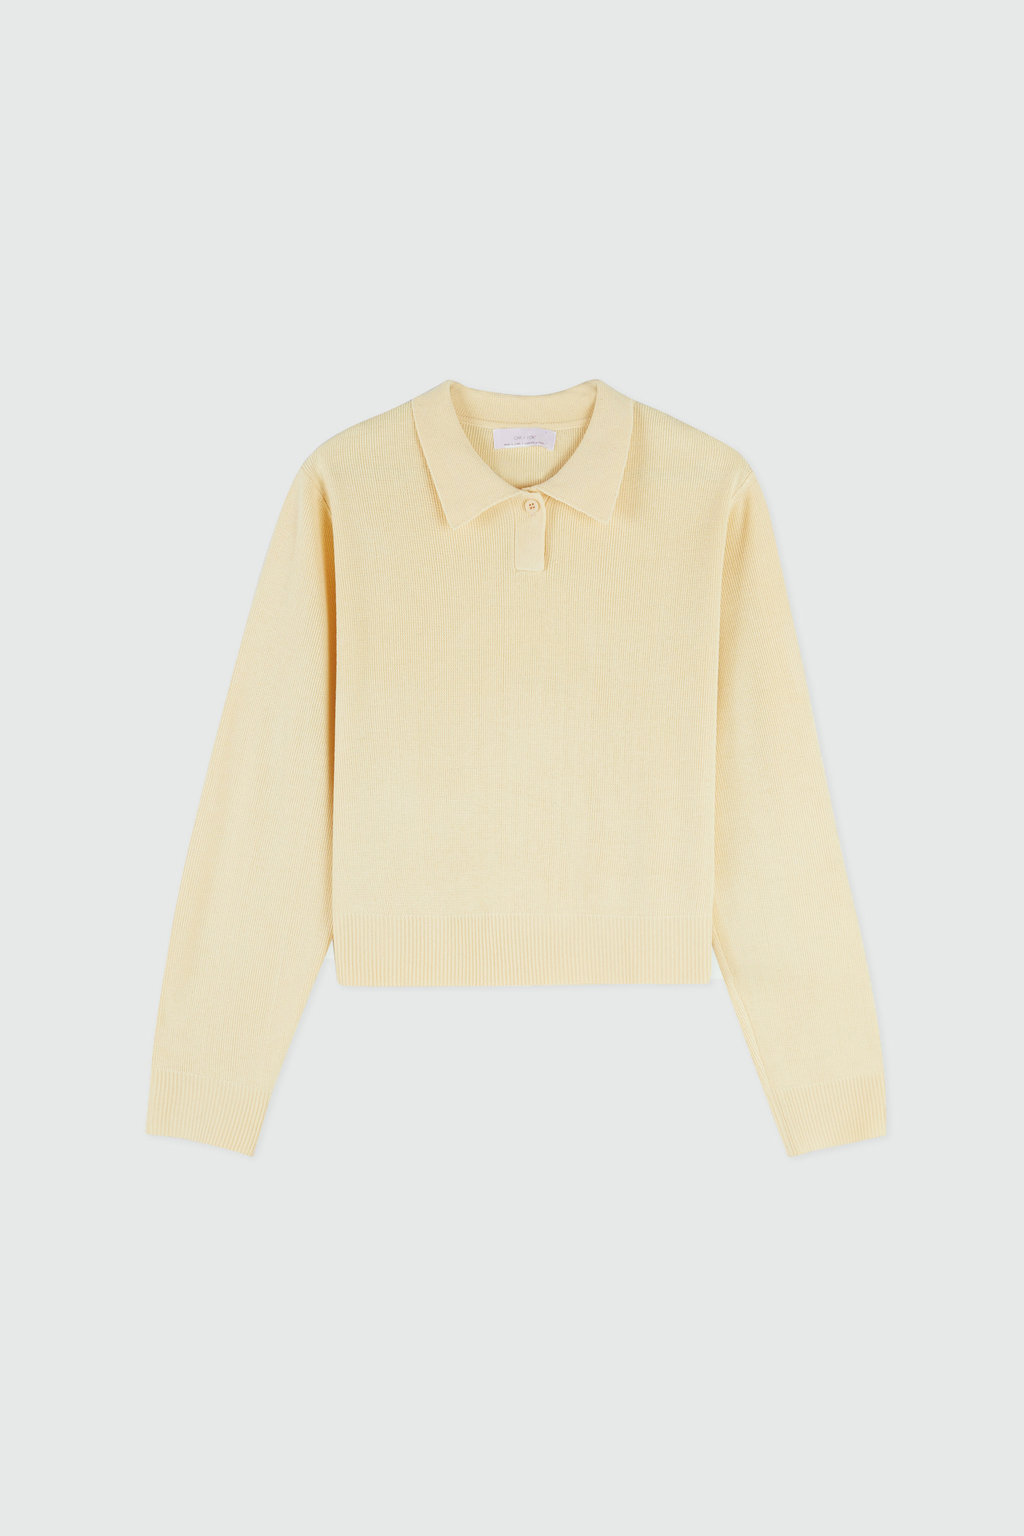 Sweater 3036 Light Yellow 5